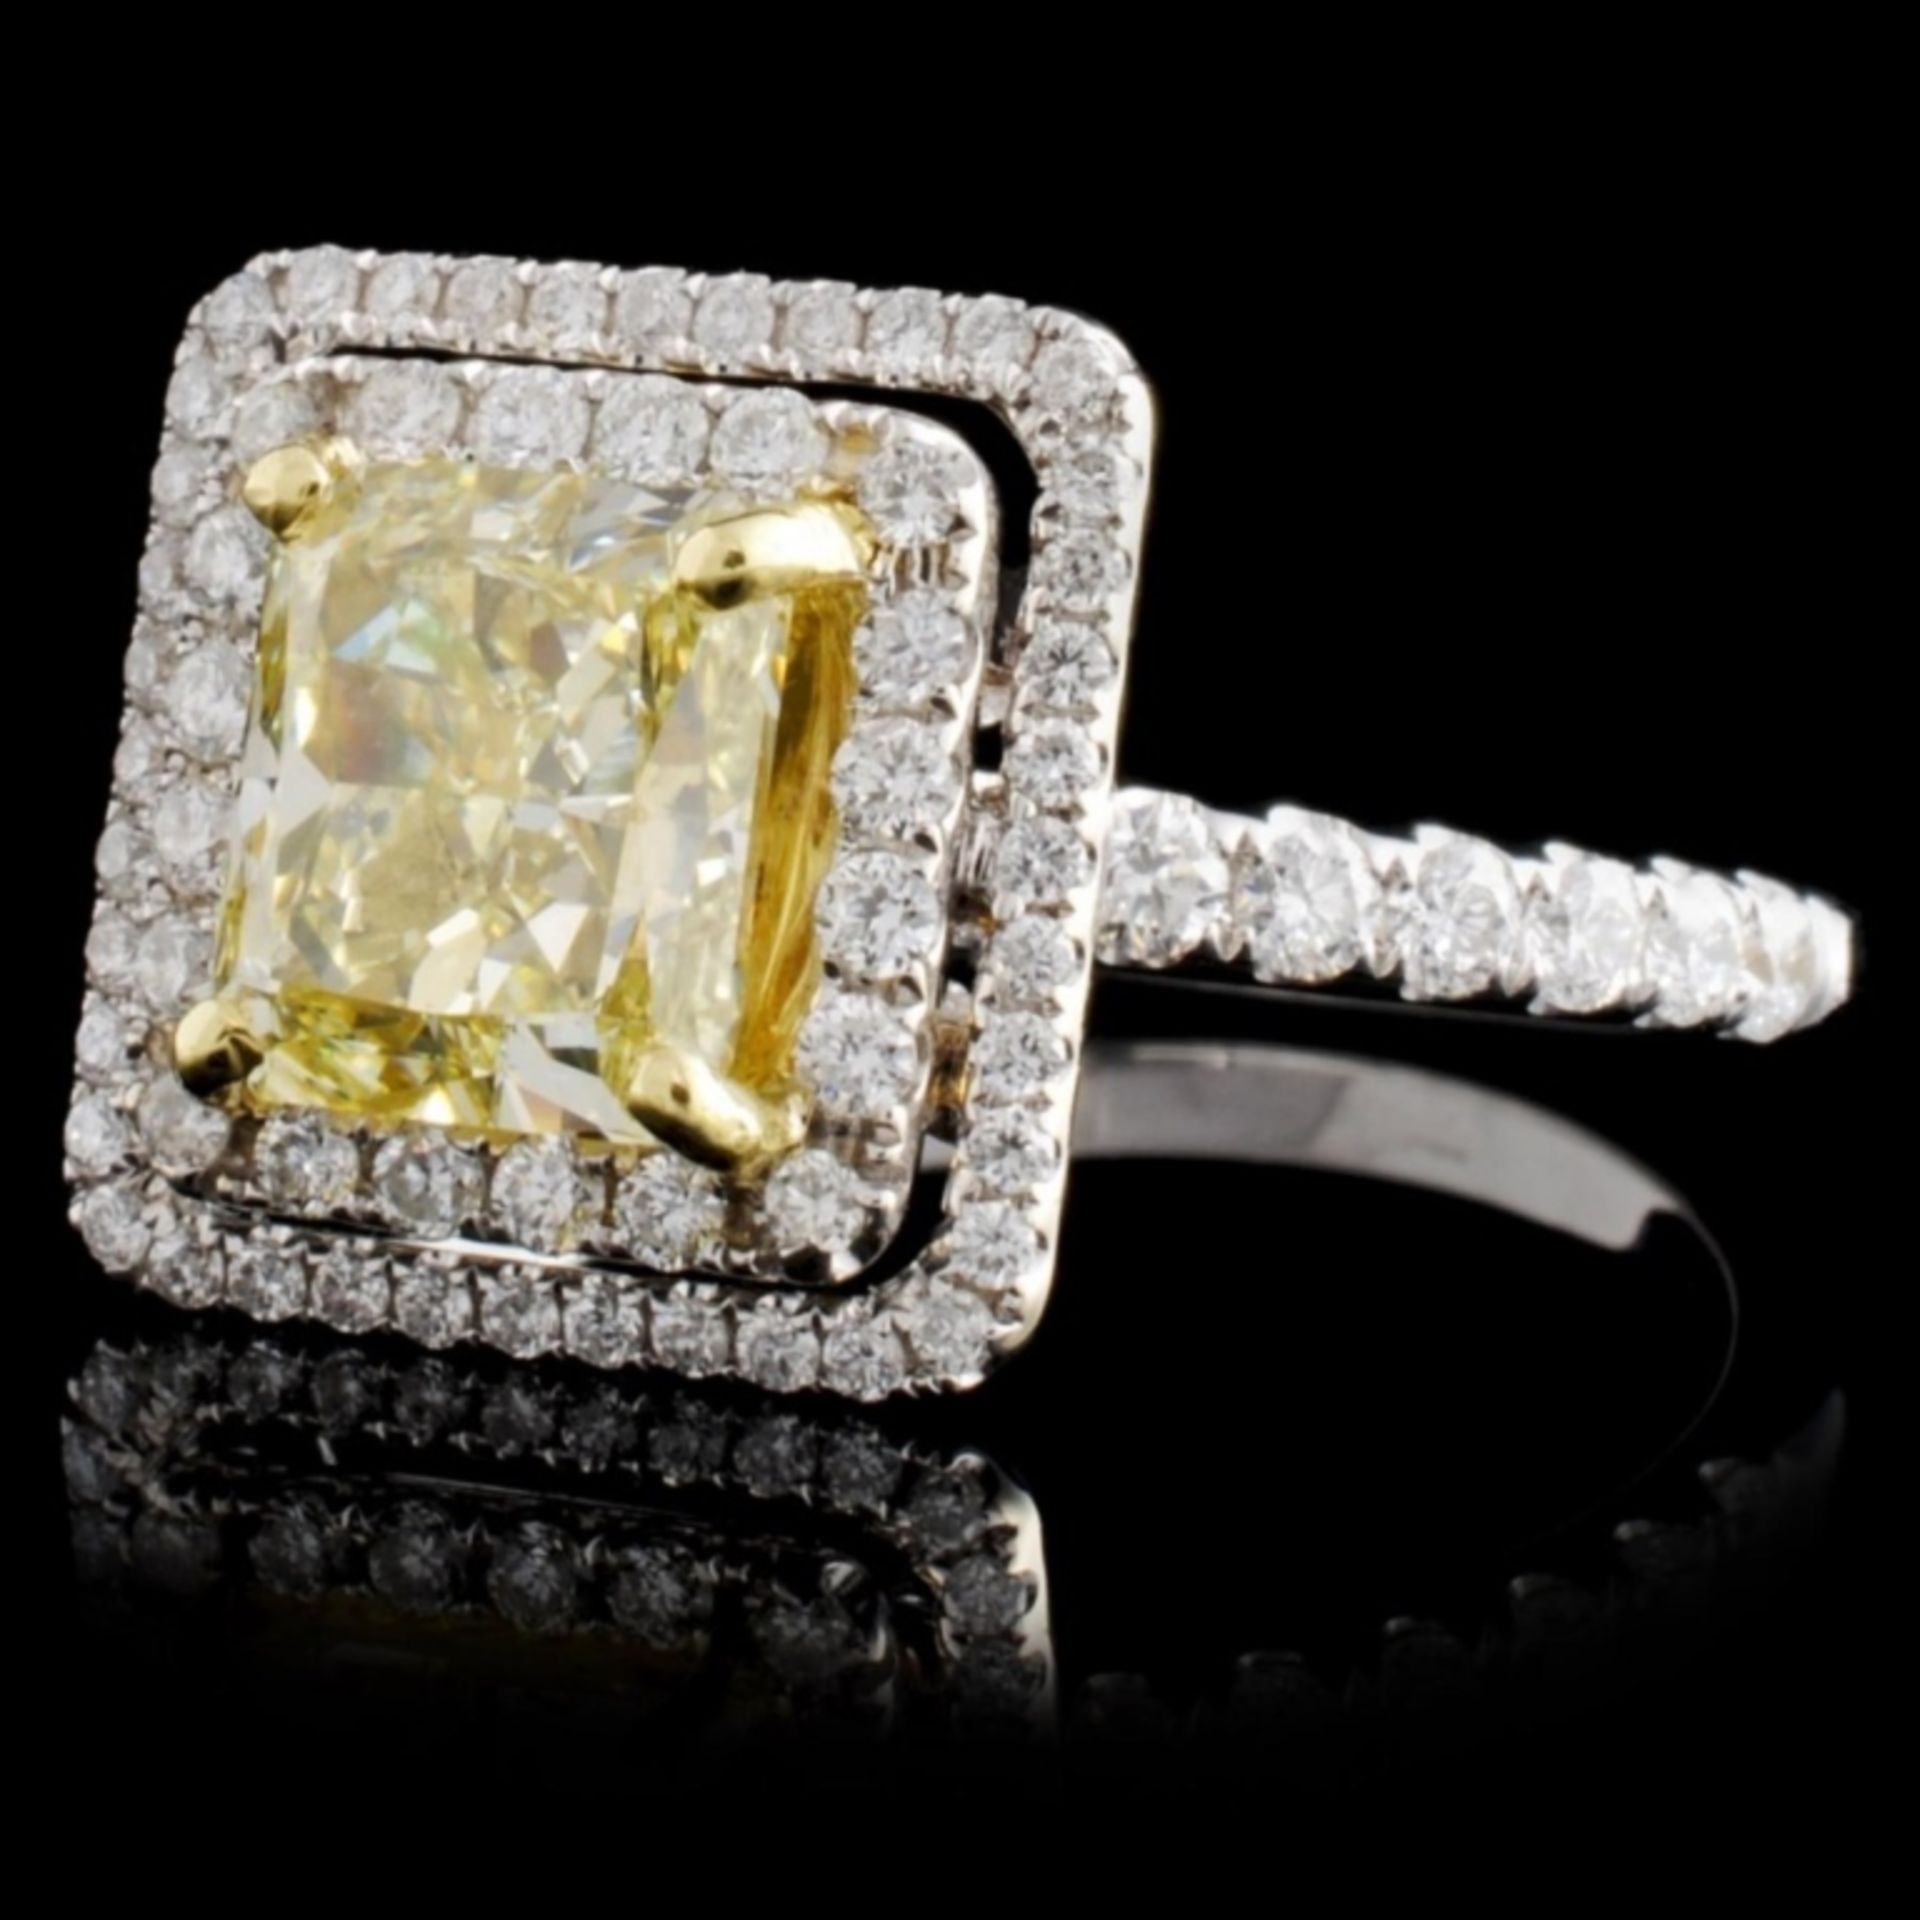 18K White Gold 2.57ctw Fancy Diamond Ring - Image 2 of 3